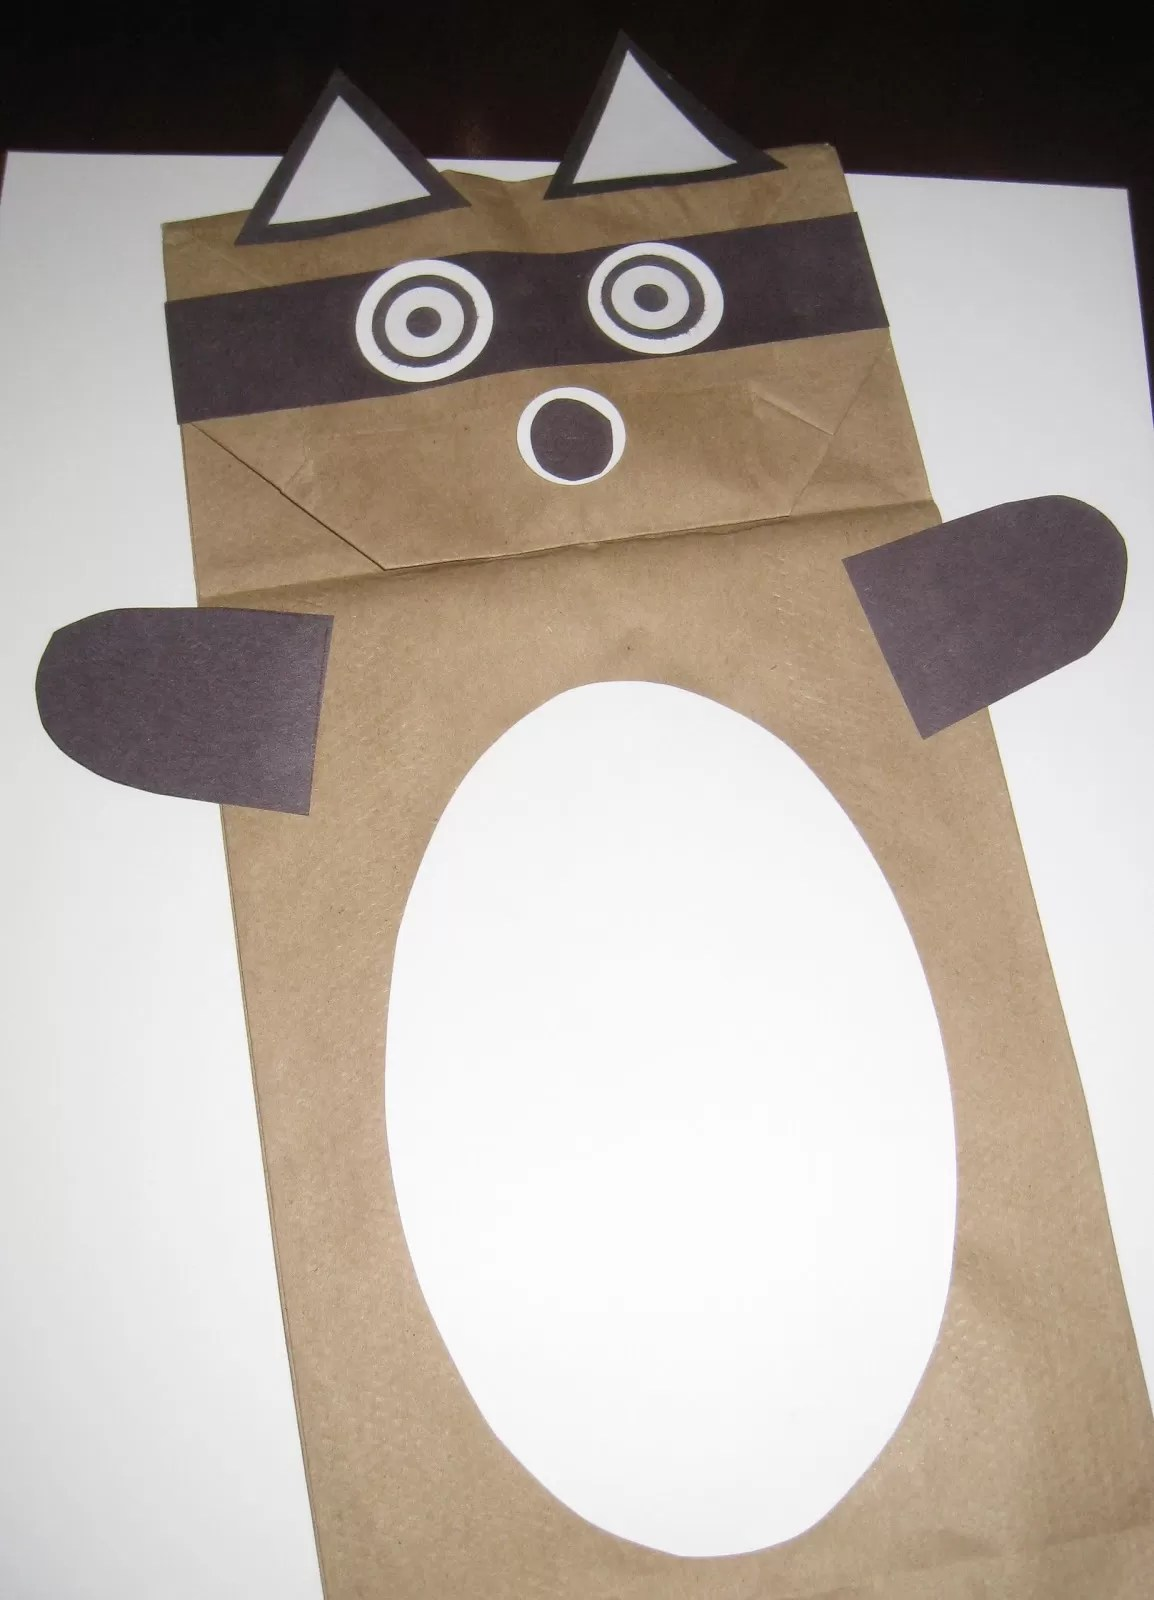 59 Paper Bag Puppets